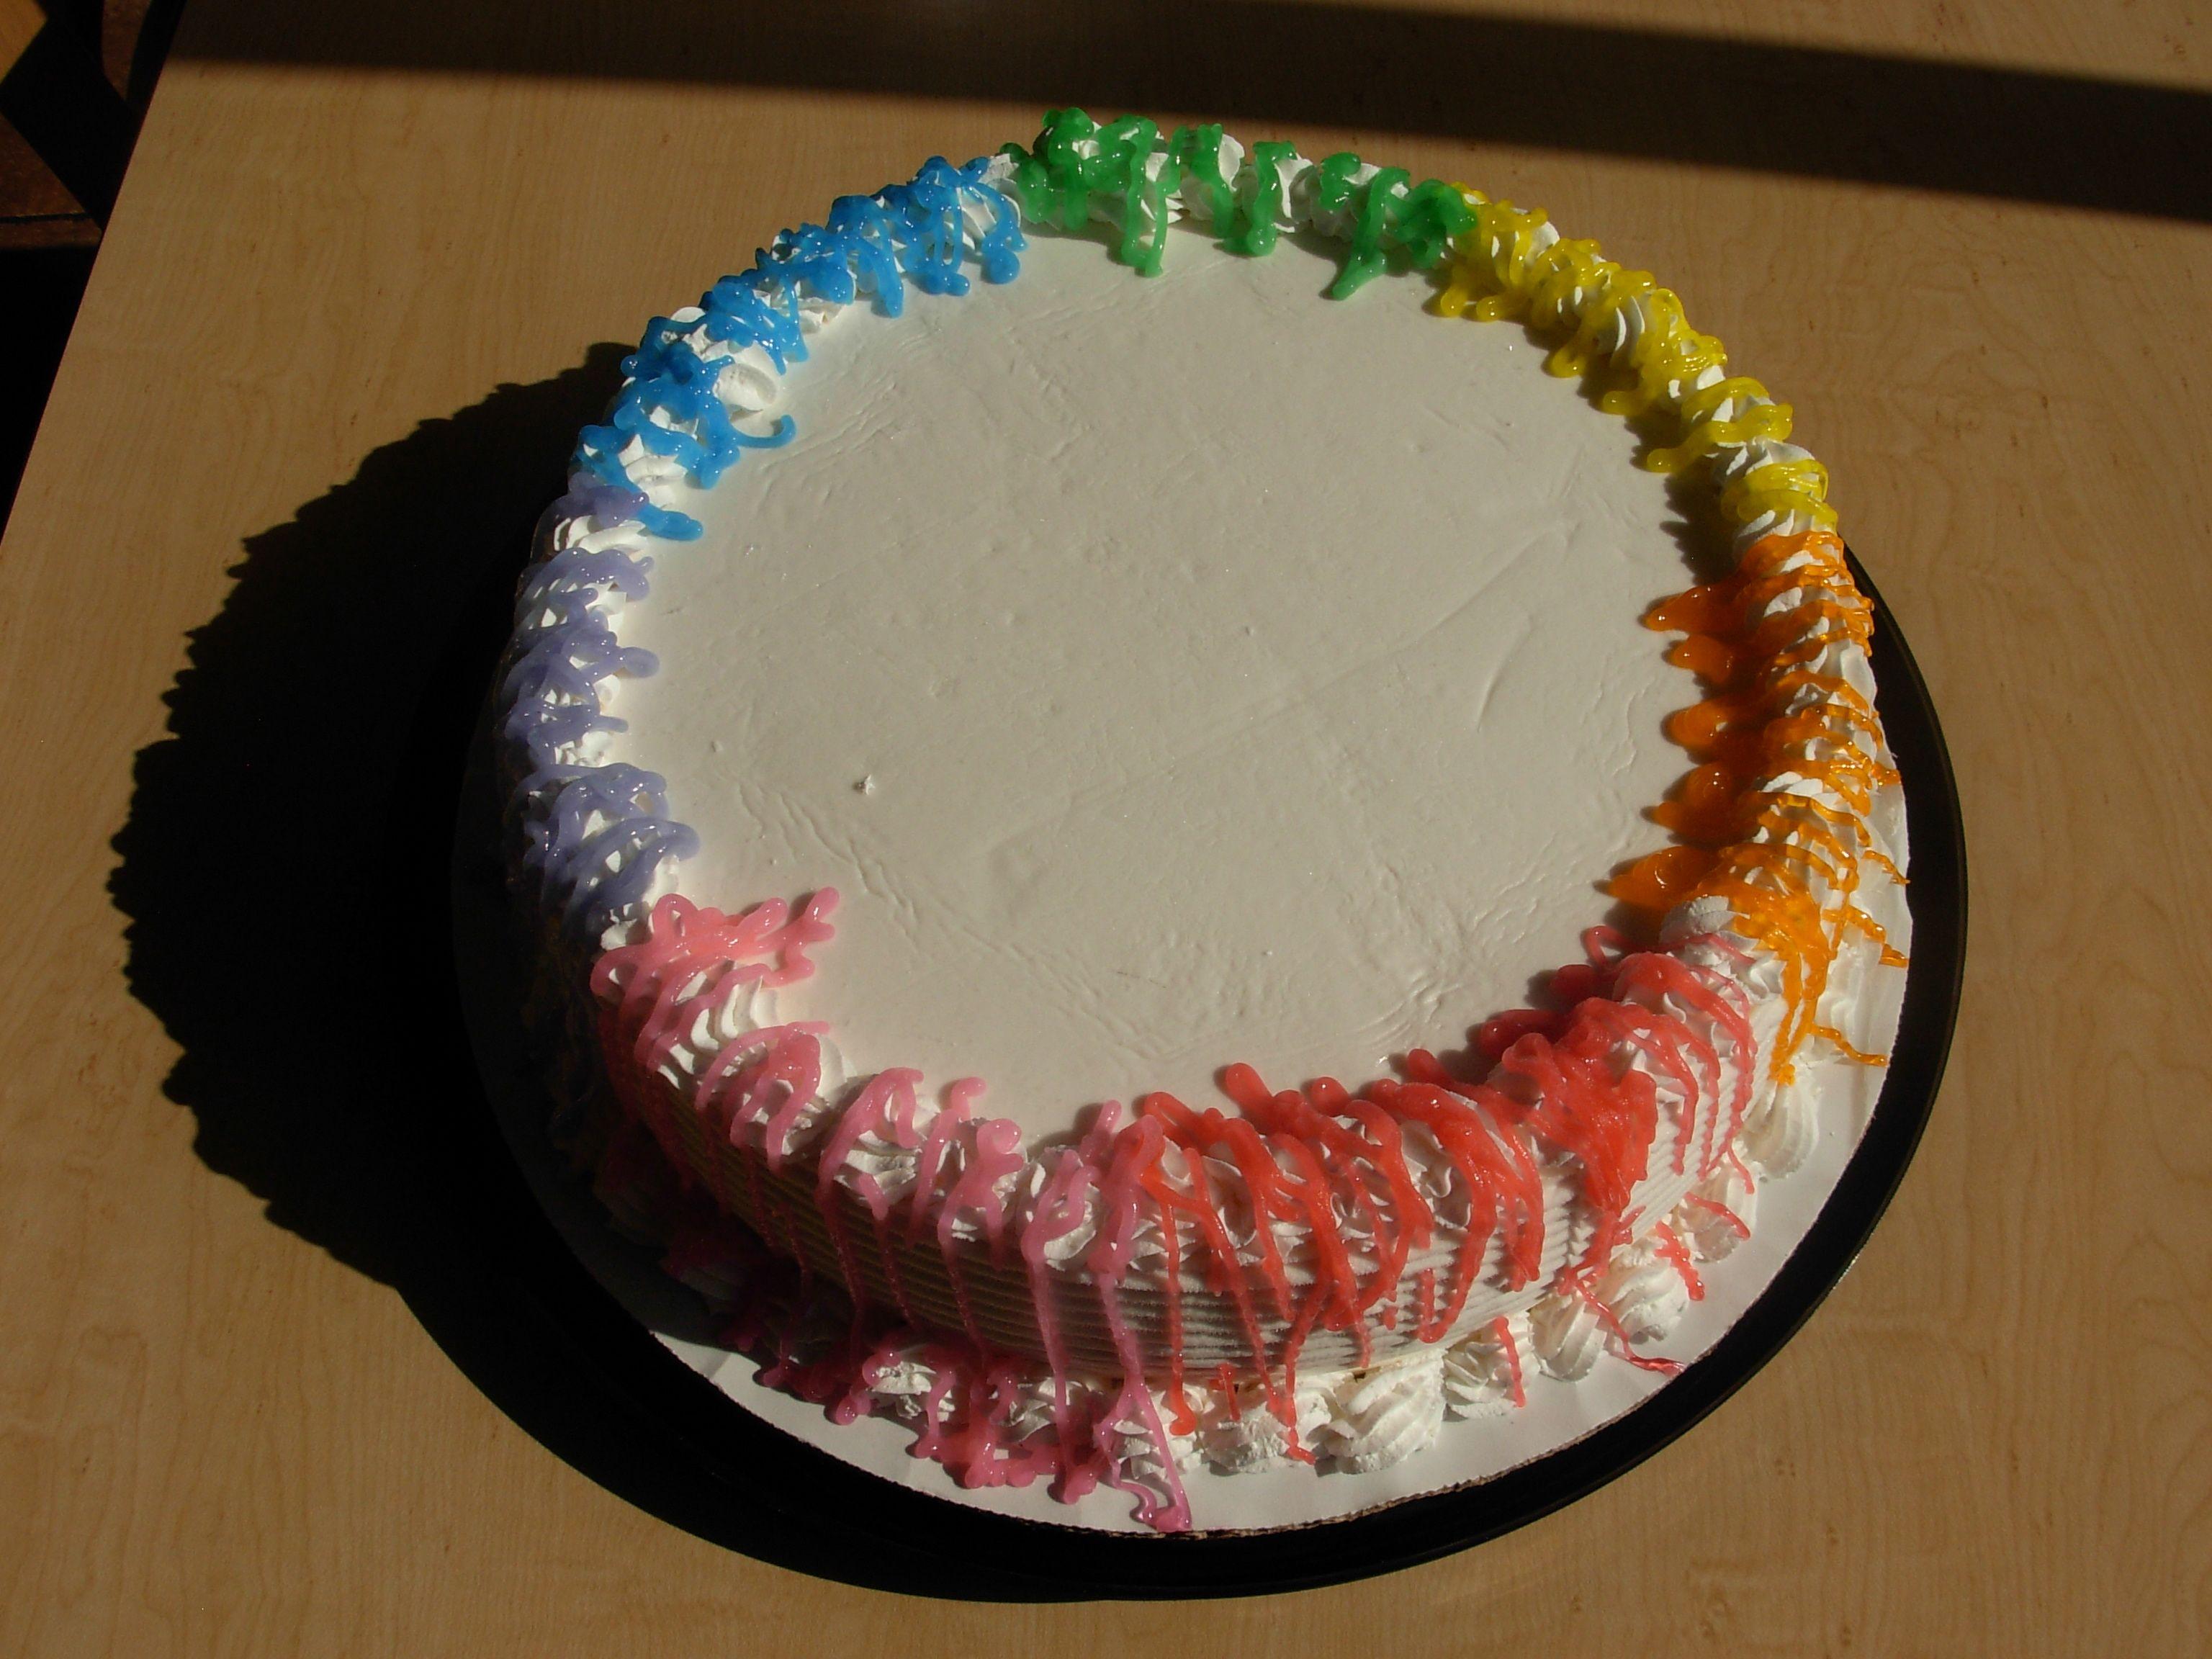 Baseball Dq Dairy Queen Ice Cream Cake The Cake Lady Pinterest